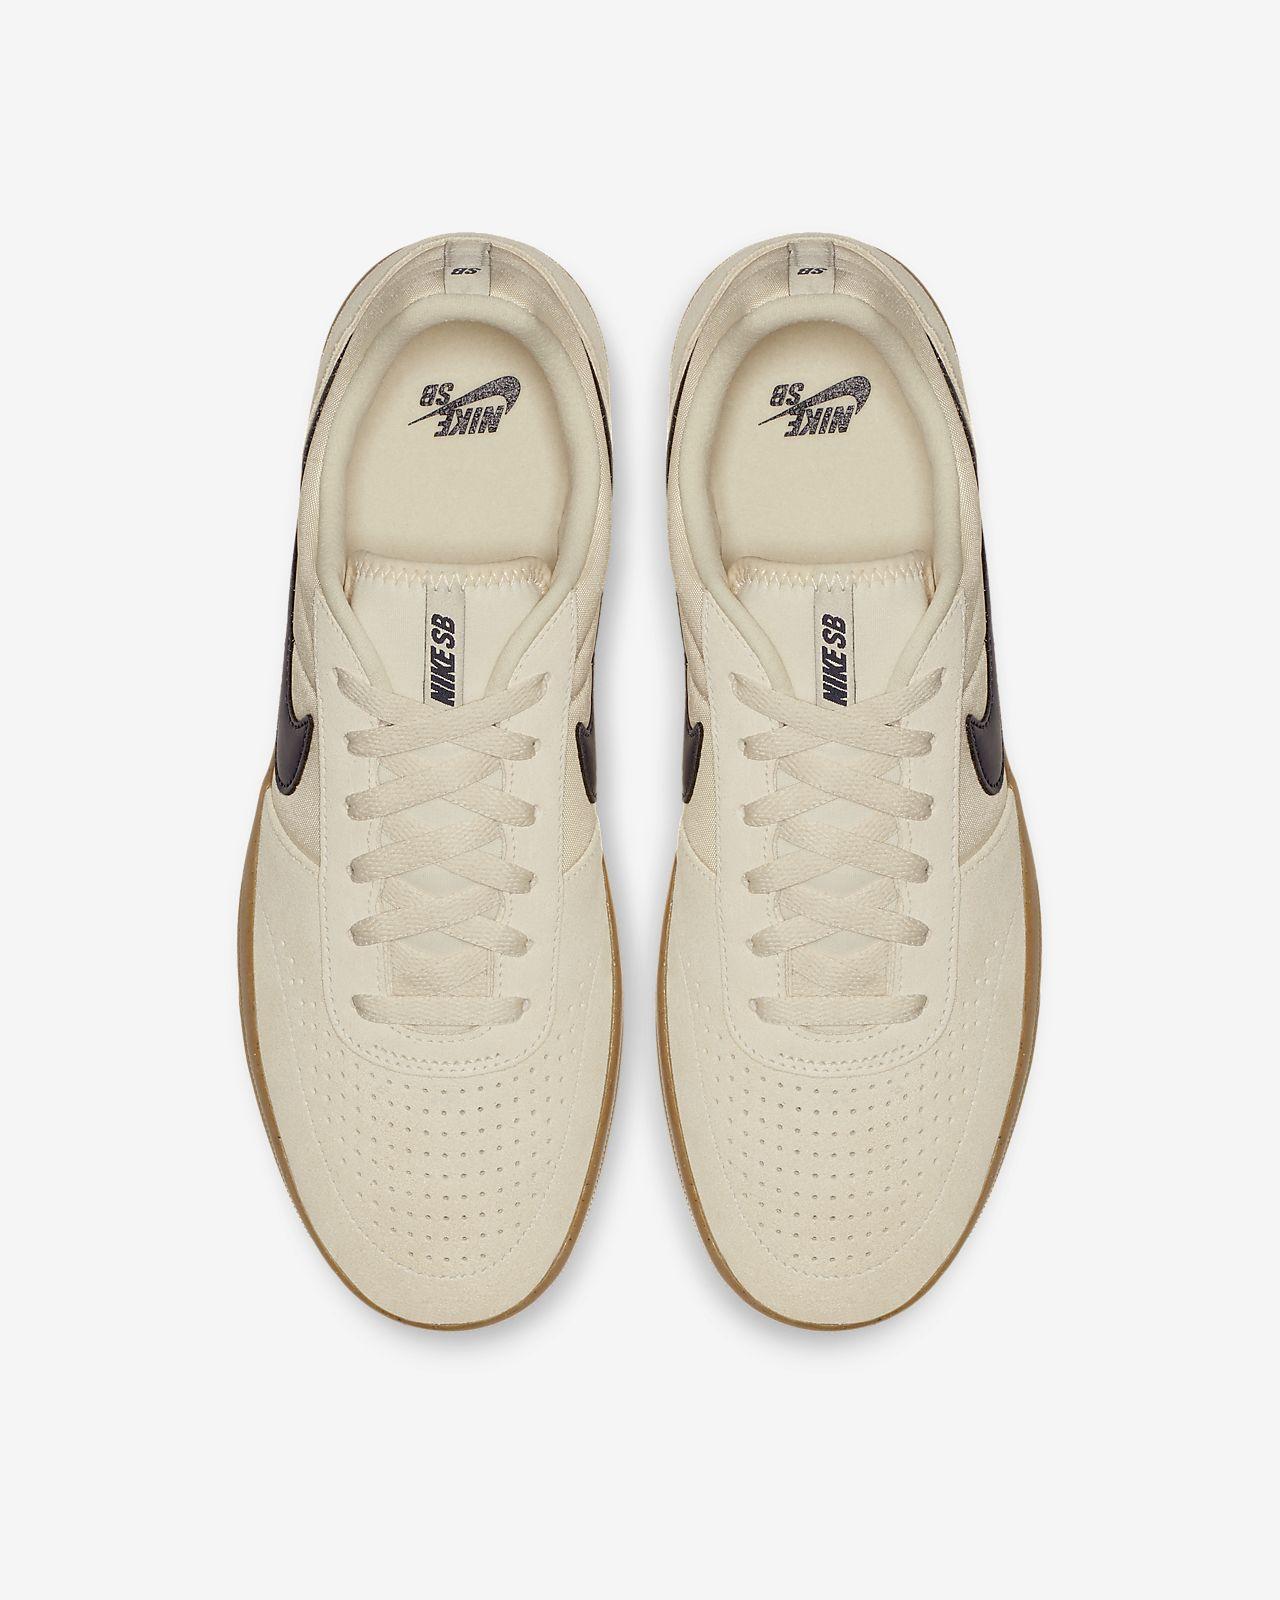 39cad711afe Nike SB Team Classic Men s Skate Shoe. Nike.com SI